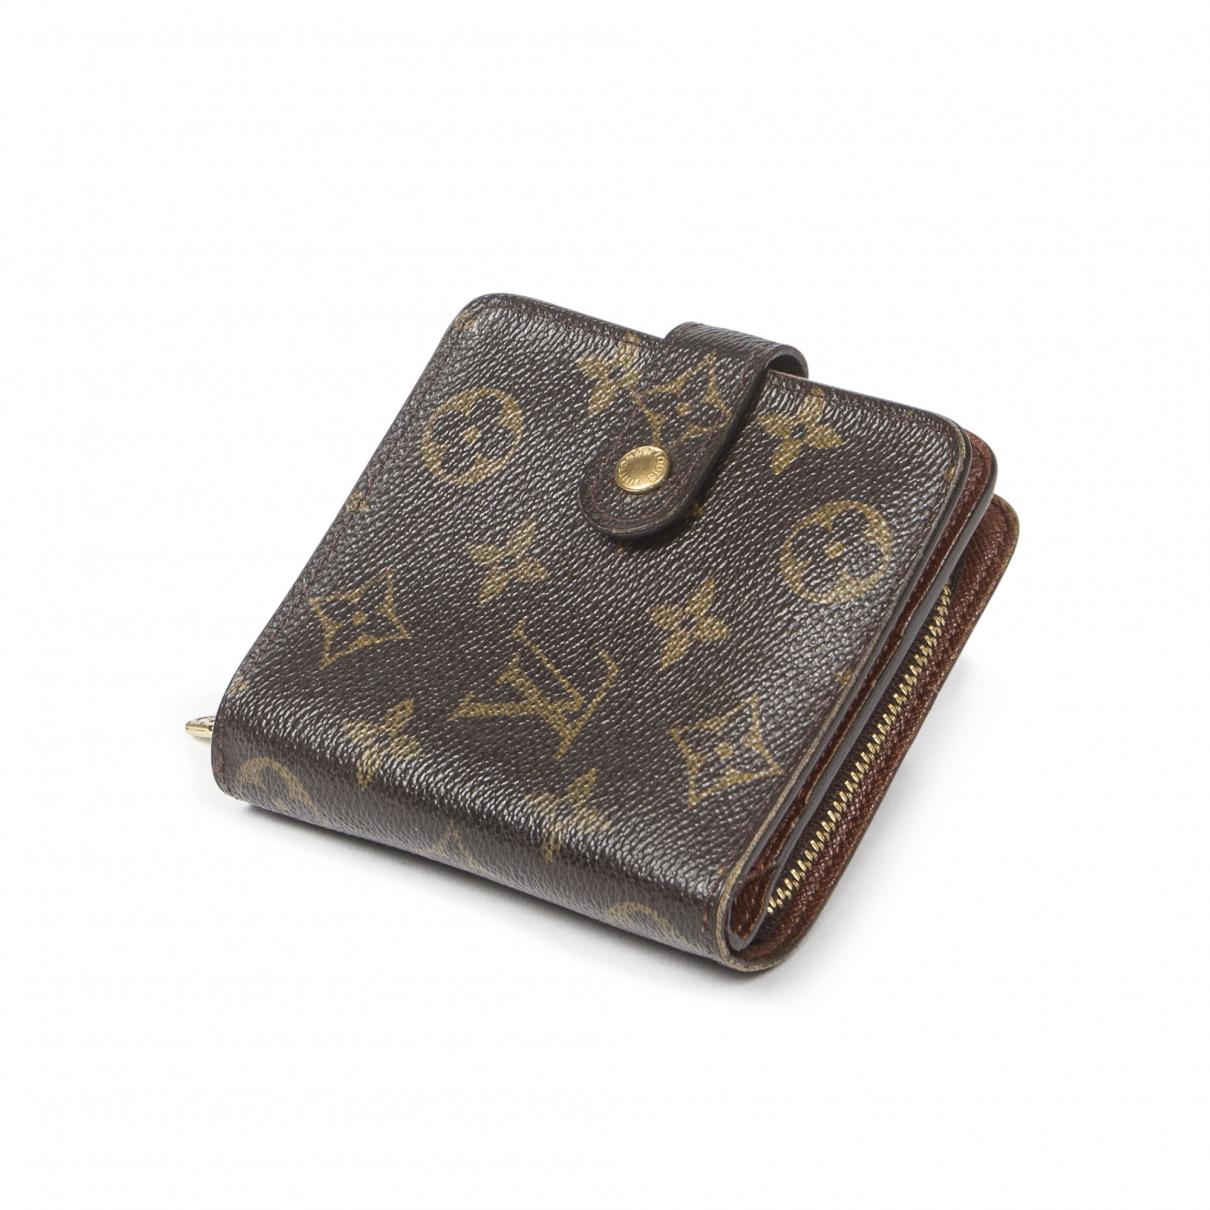 Louis Vuitton \N Brown Cotton wallet for Women \N